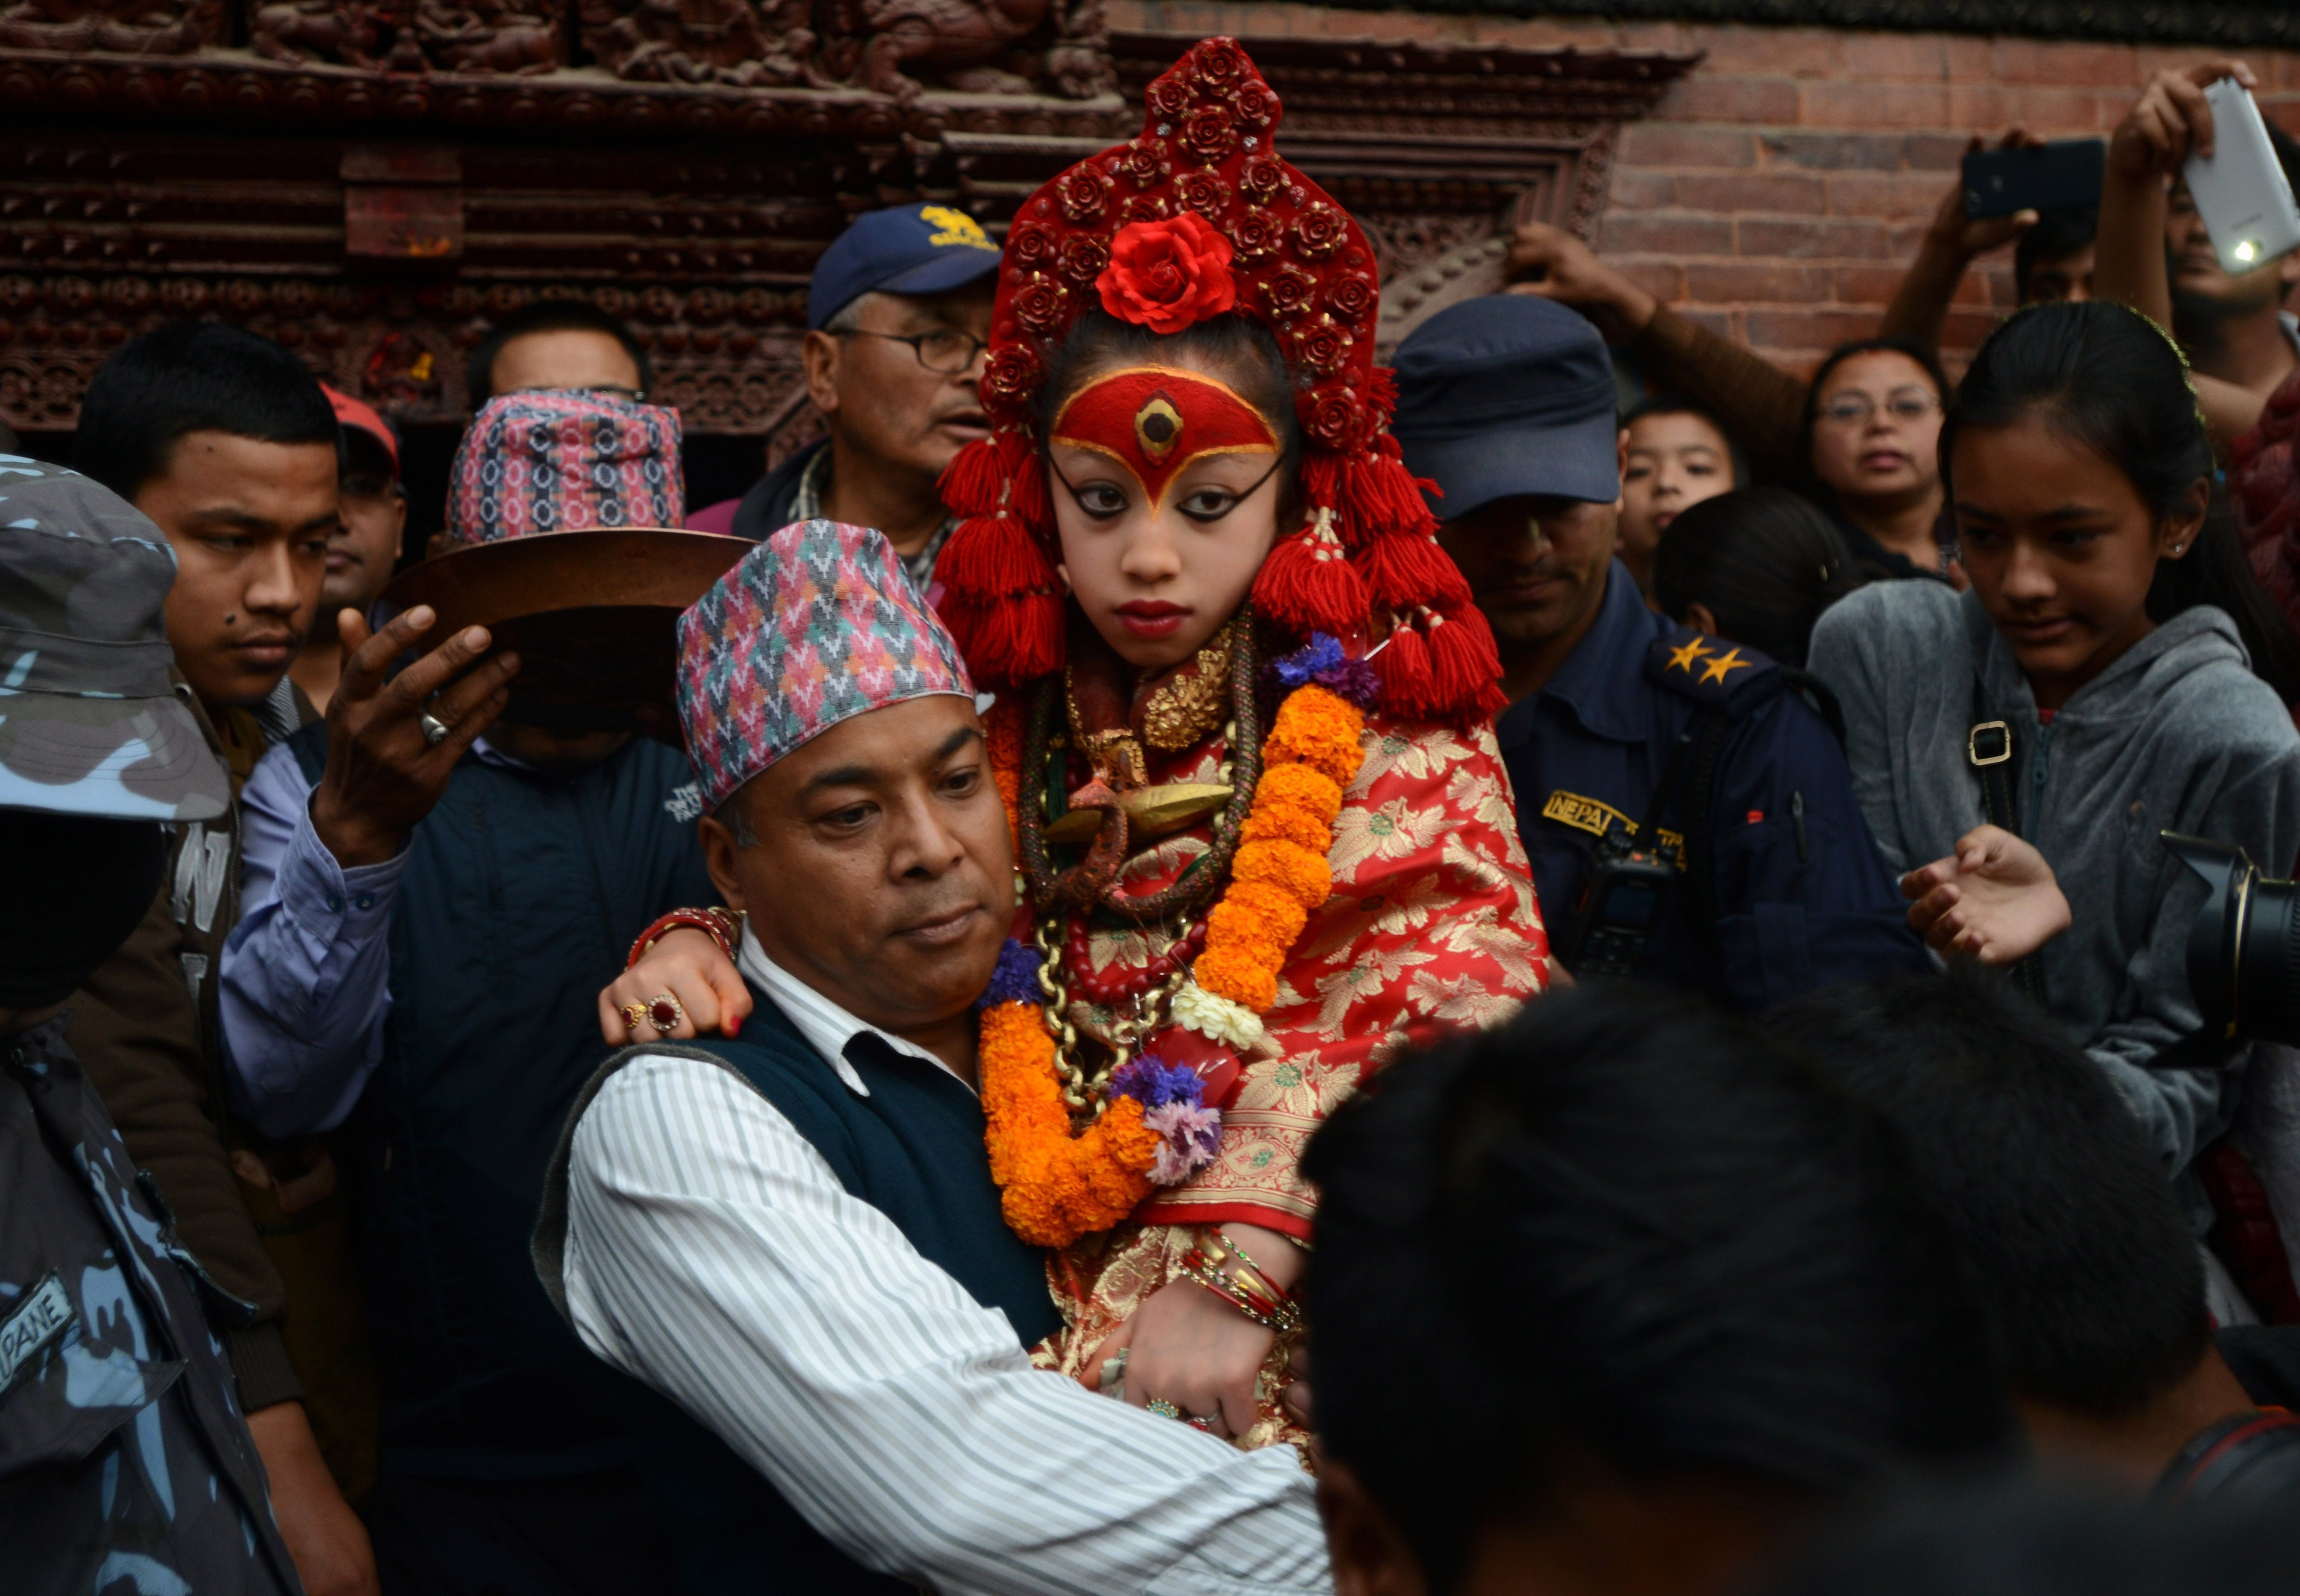 The Very Strange Life Of Nepal's Child Goddess